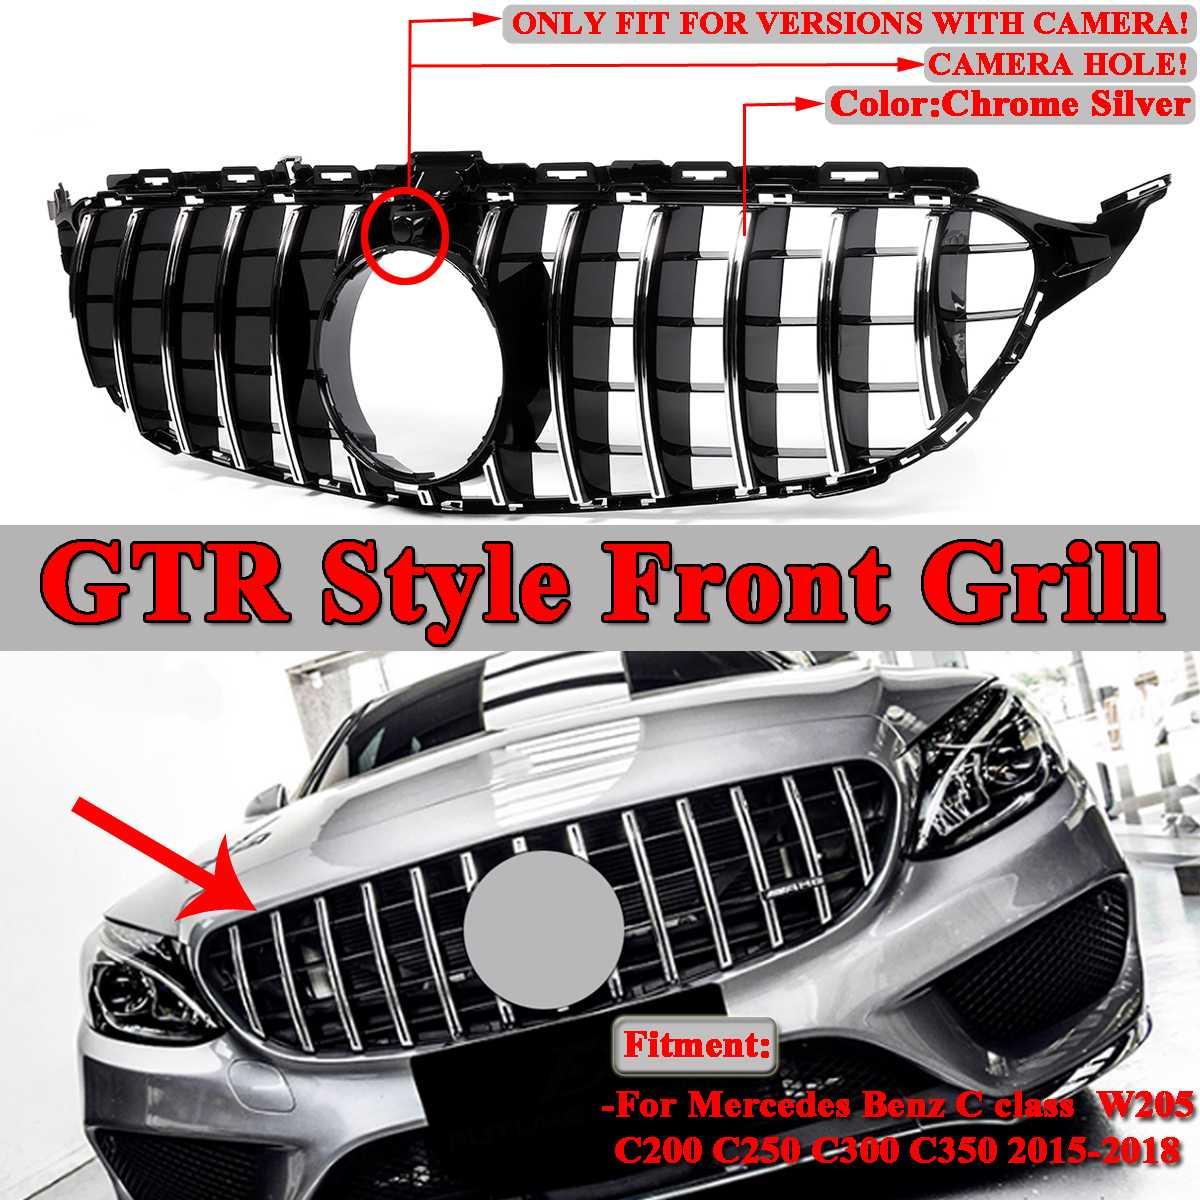 W205 C200 C250 C300 C350 2015 2018 2Dr 4Dr W205 GT R GTR Style Car Front